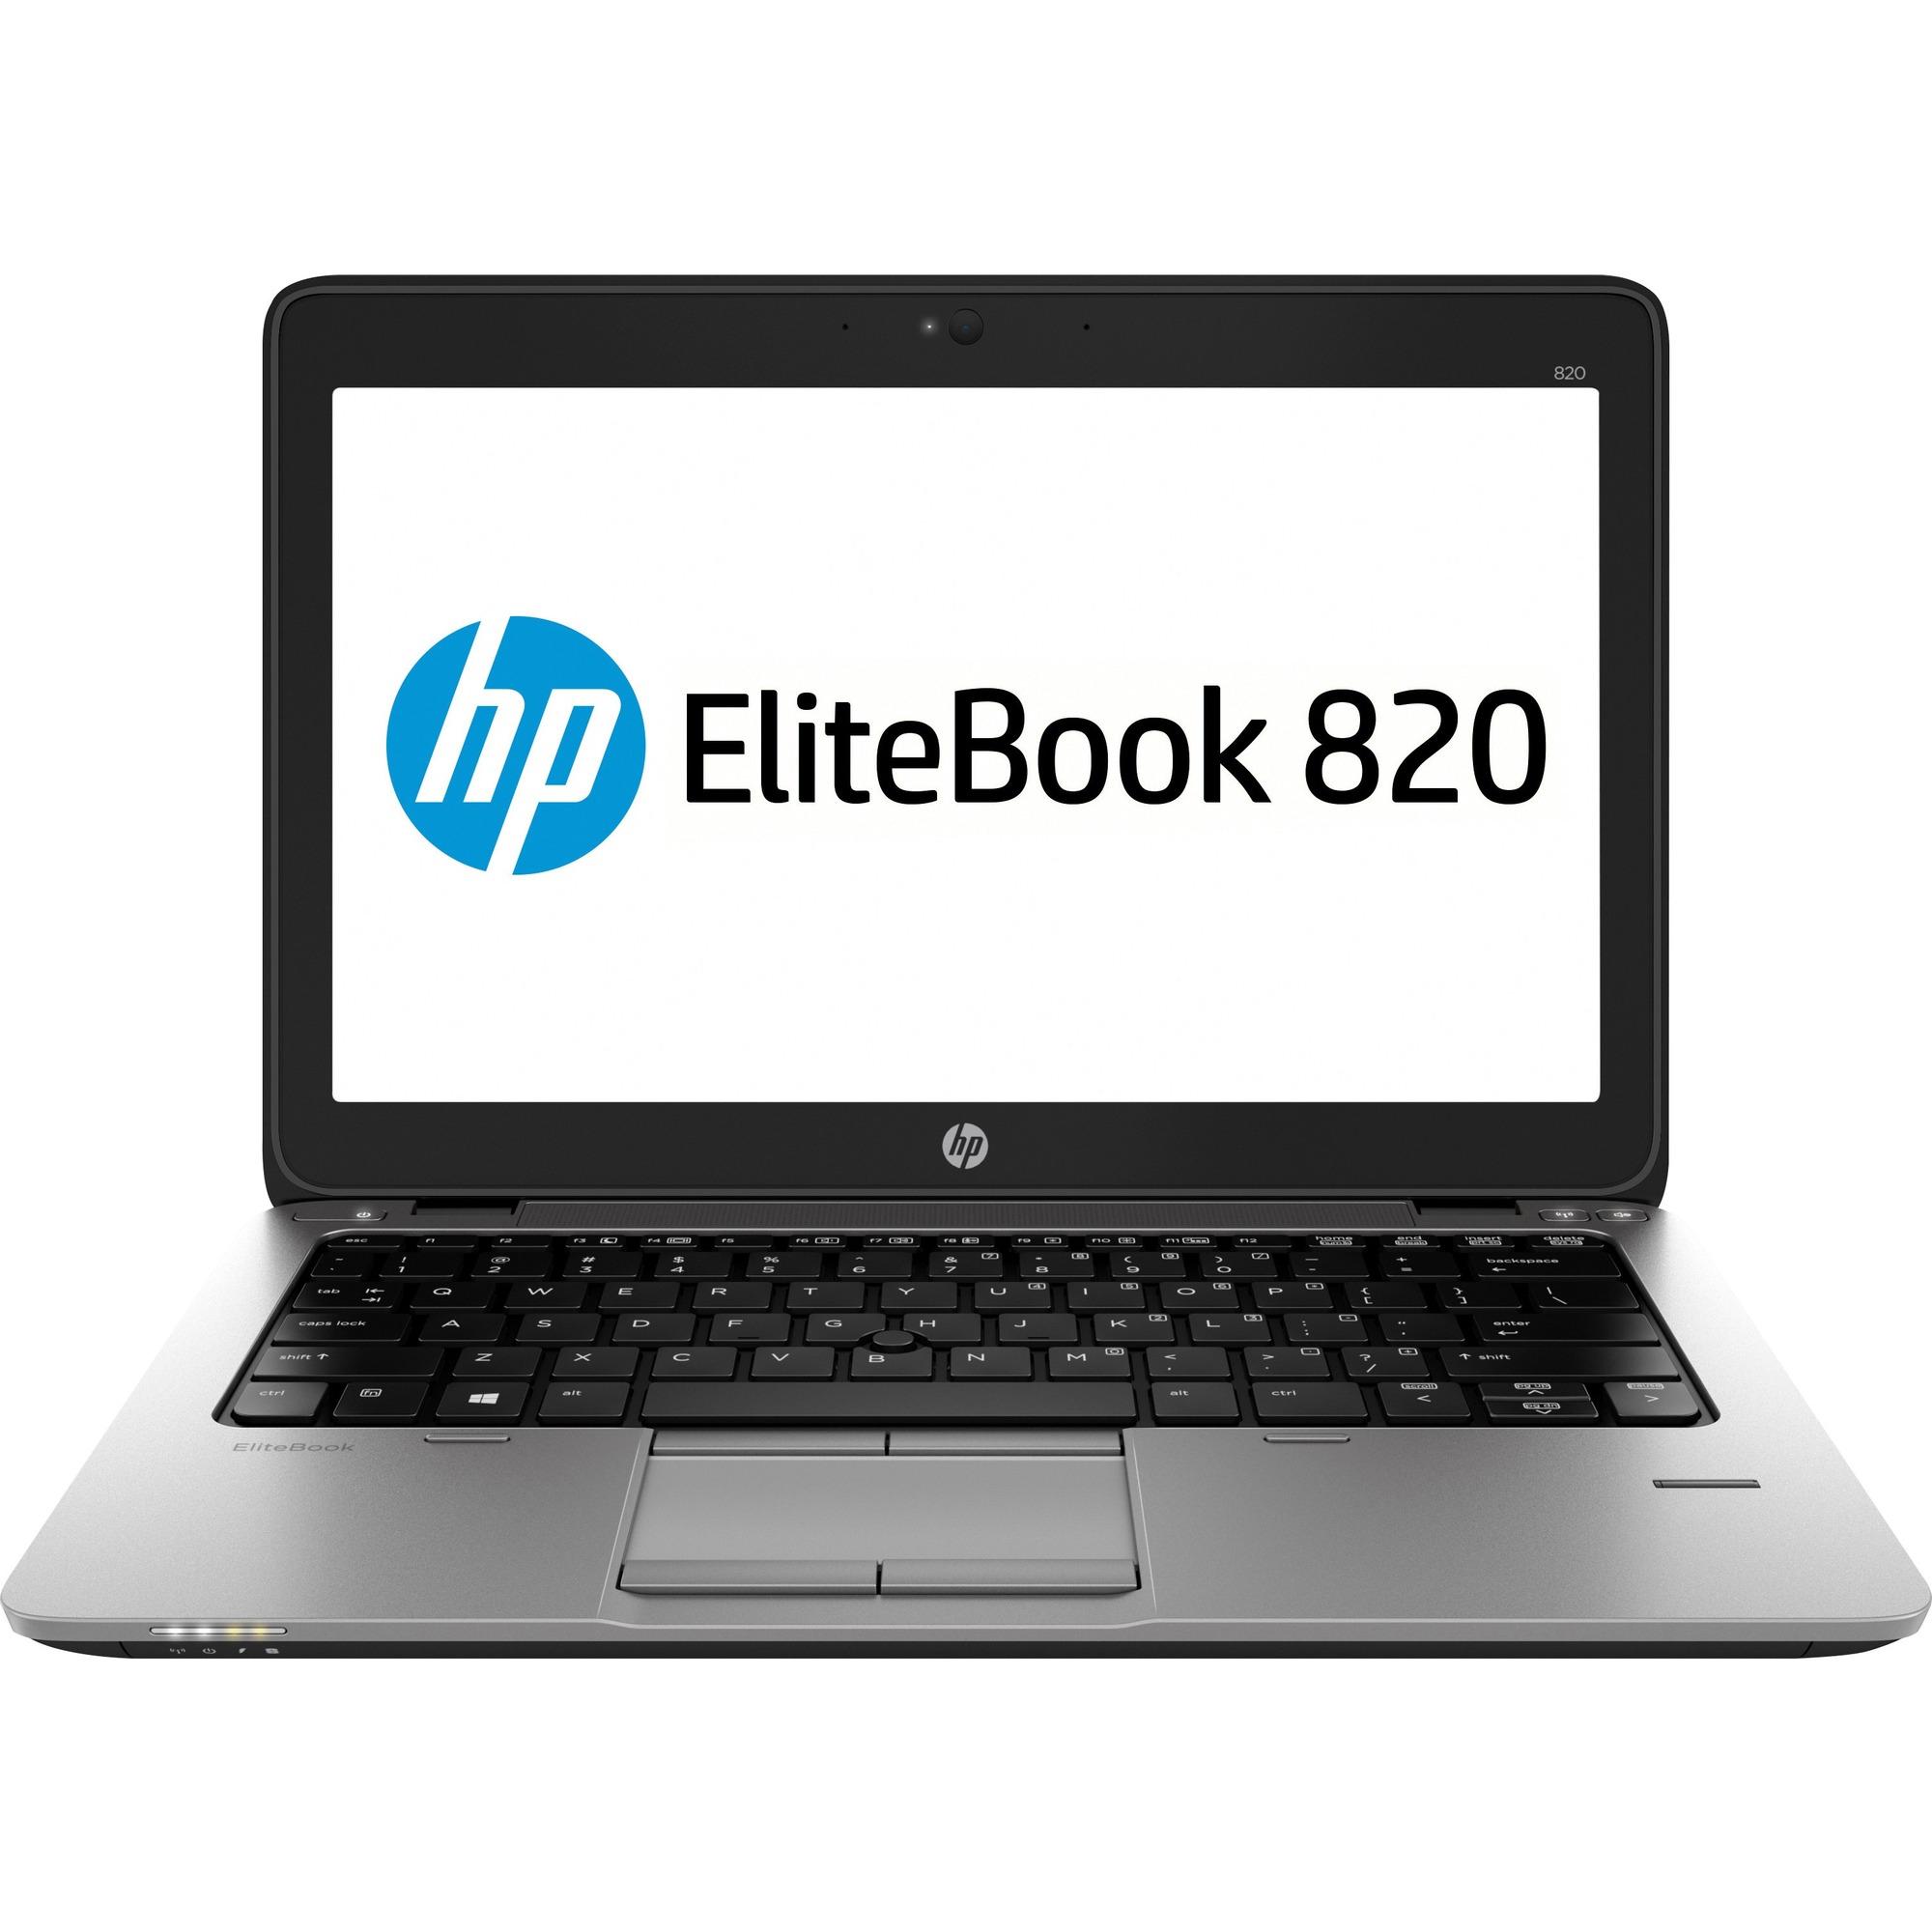 HP EliteBook 820 G2 31.8 cm 12.5inch LED Notebook - Intel Core i7 i7-5500U 2.40 GHz